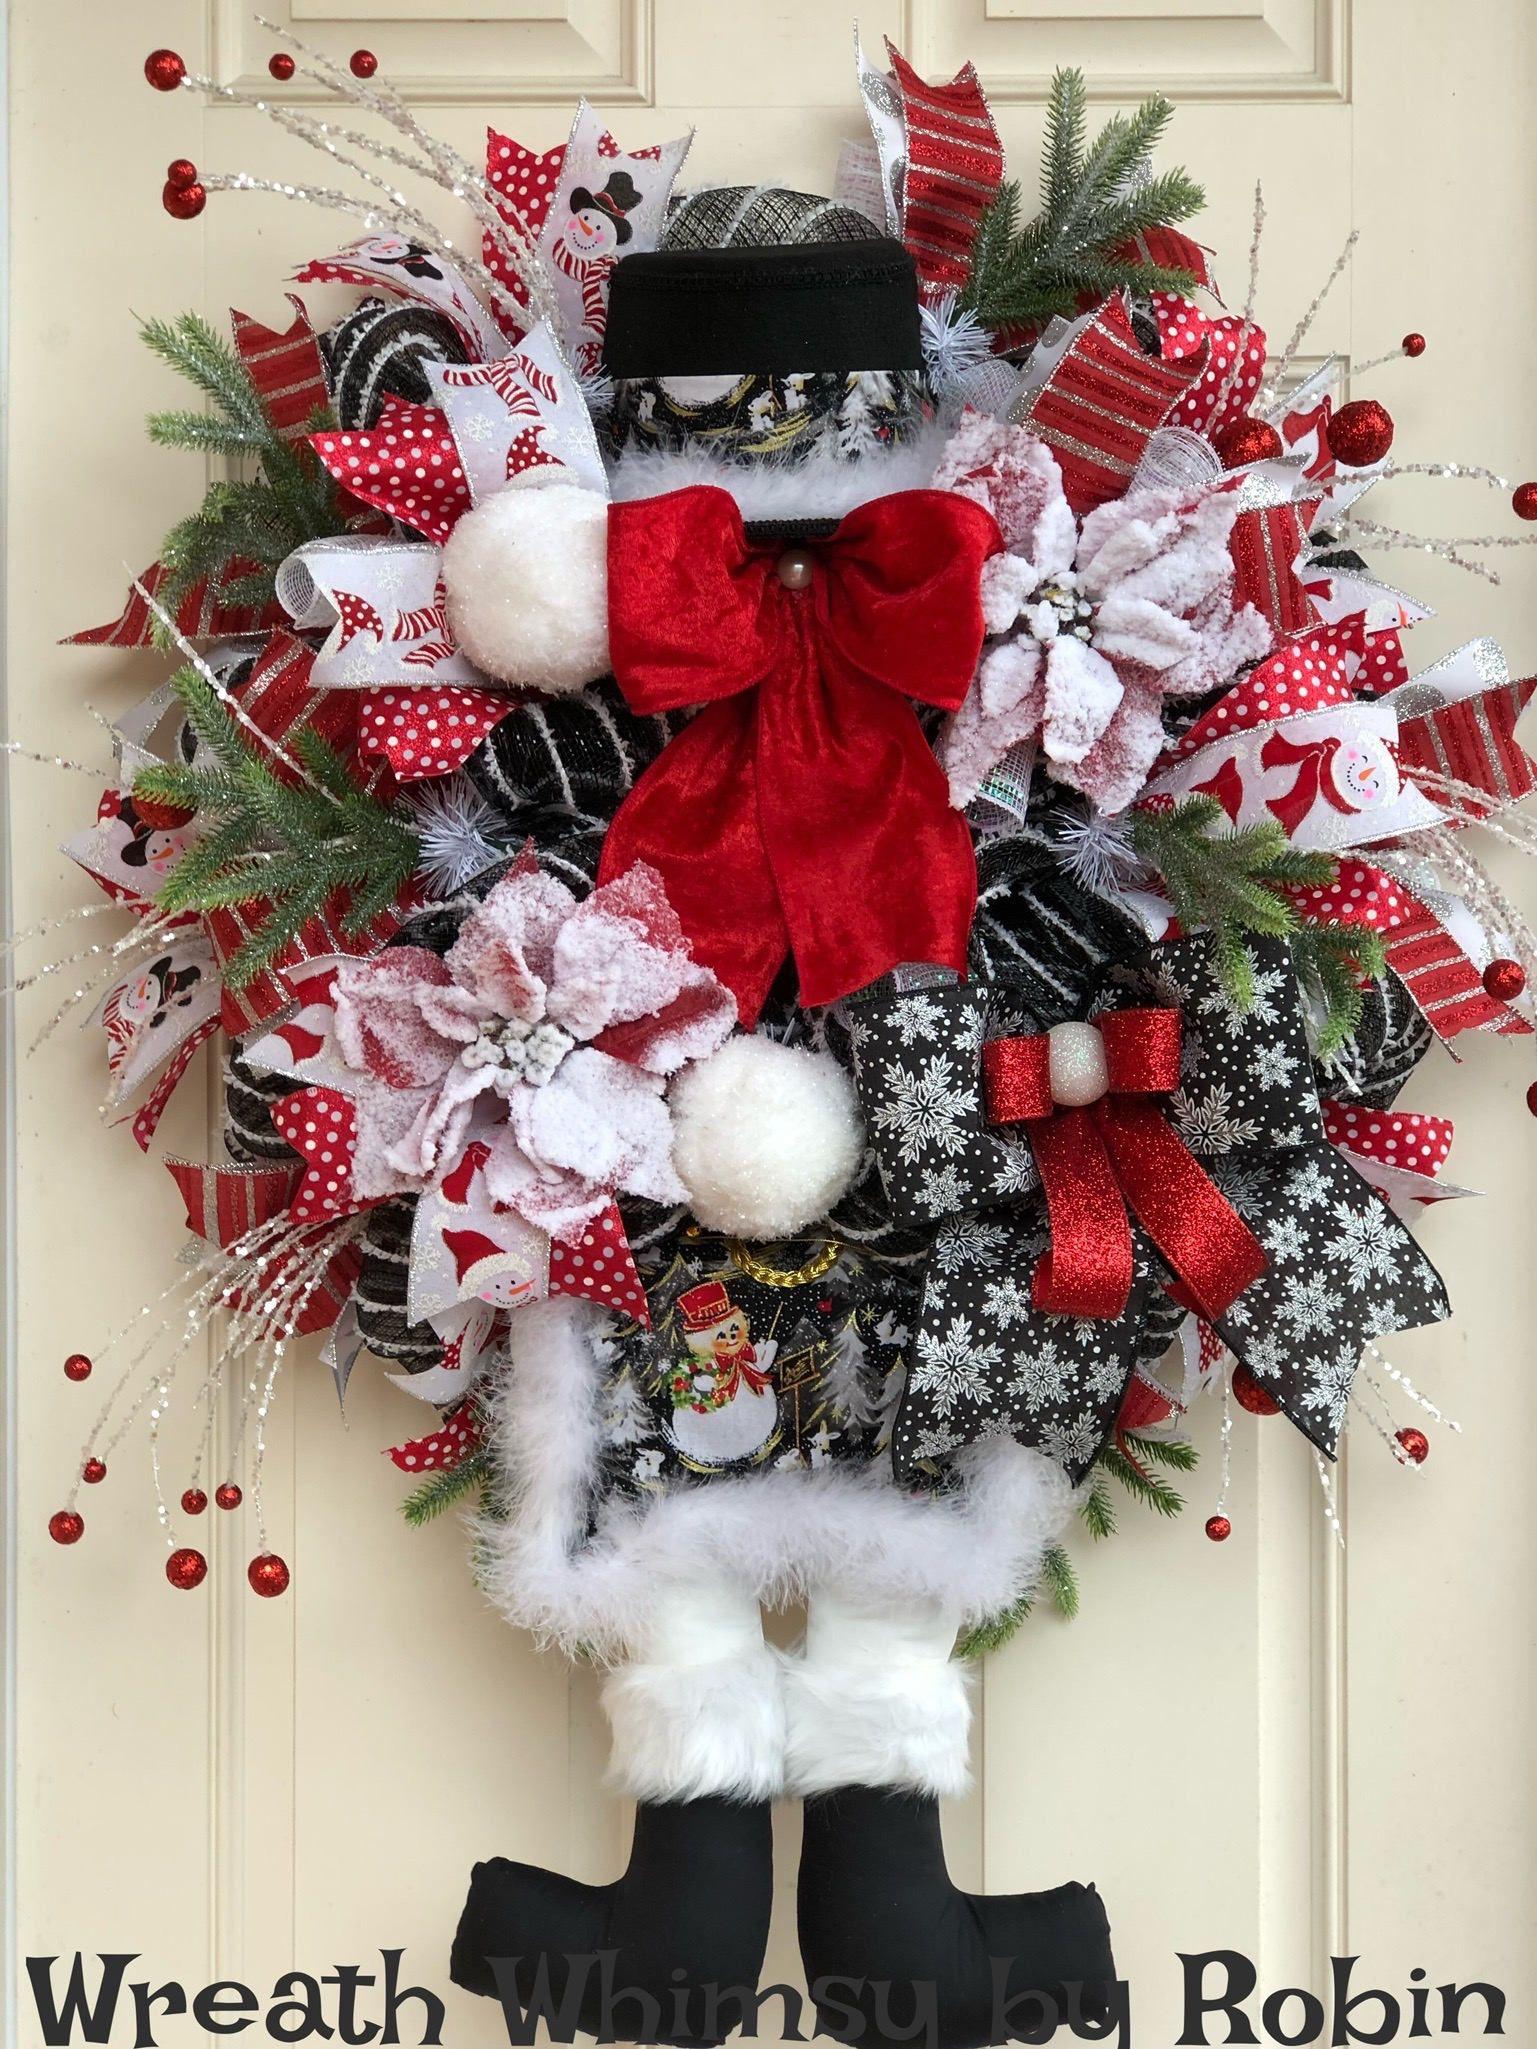 Xl Winter Snowman Wreath In Red Black White Christmas Wreath Holiday Wreath Snowman Decor Holiday Decor Character Wreath Christmas Wreaths Holiday Decor